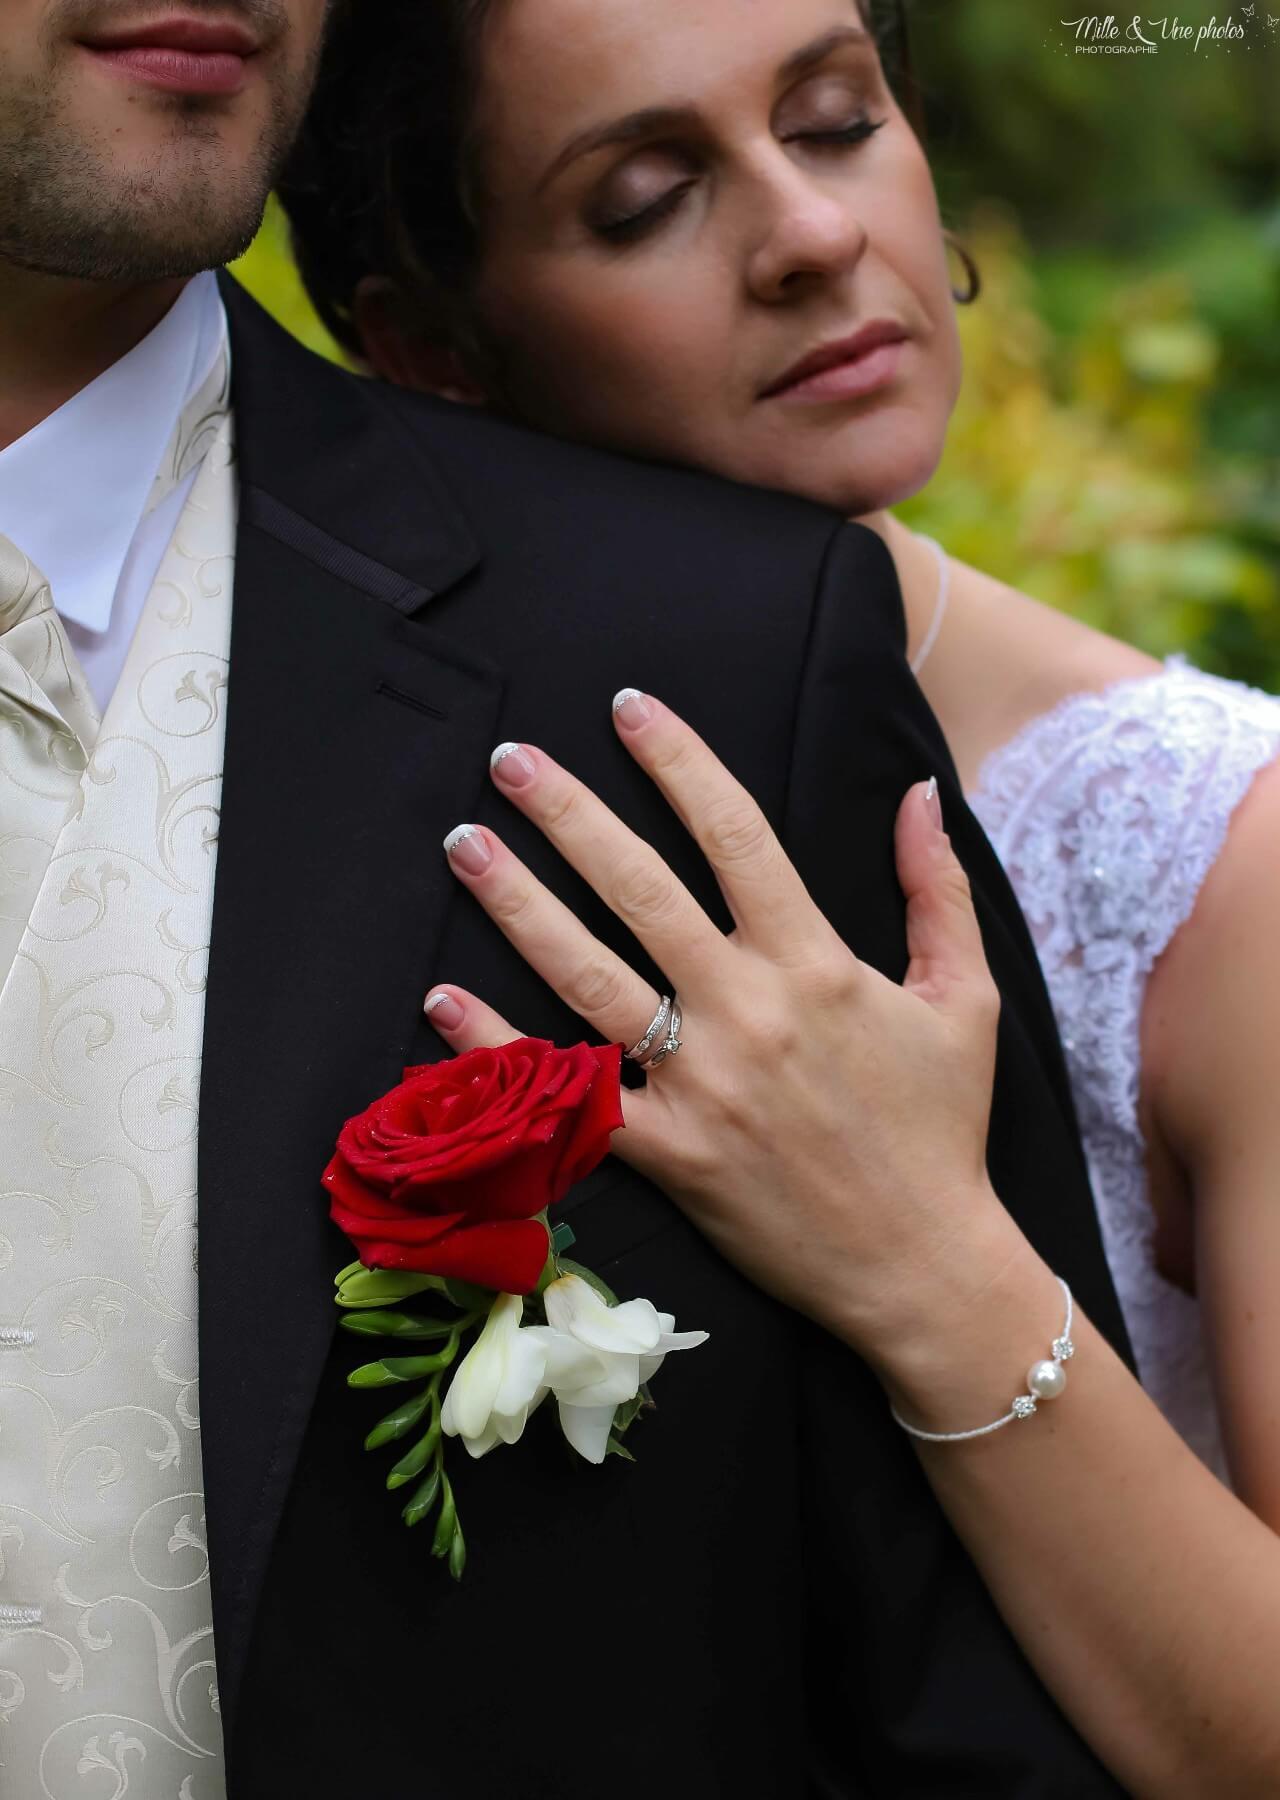 Mariage couple 1001photos moselle 4